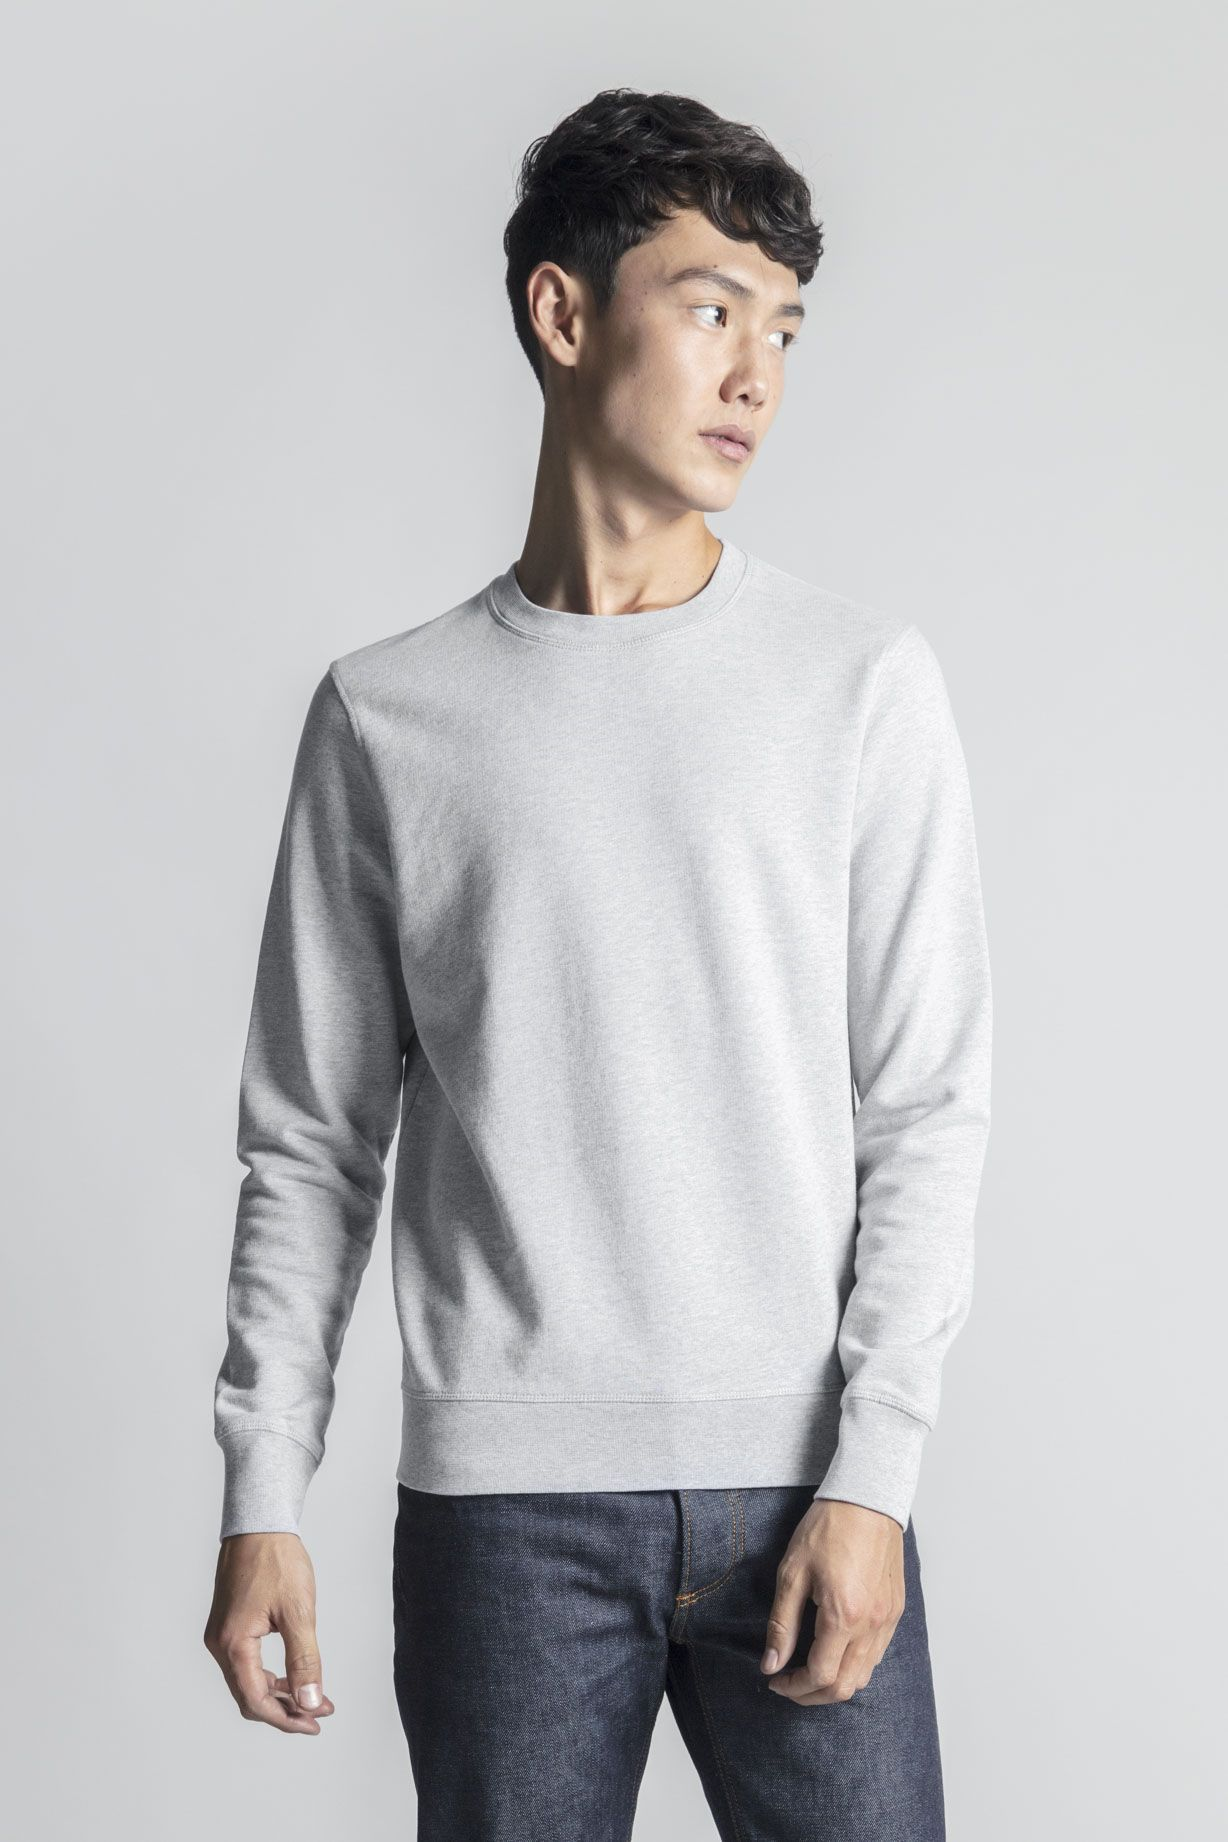 The Asket Sweatshirt A Minimal Take On The Classic Crew Neck Sweatshirt Premium Quality Egyptian Cotton Lo Sewing Men Long Sleeve Tshirt Men Mens Sweatshirts [ 1842 x 1228 Pixel ]